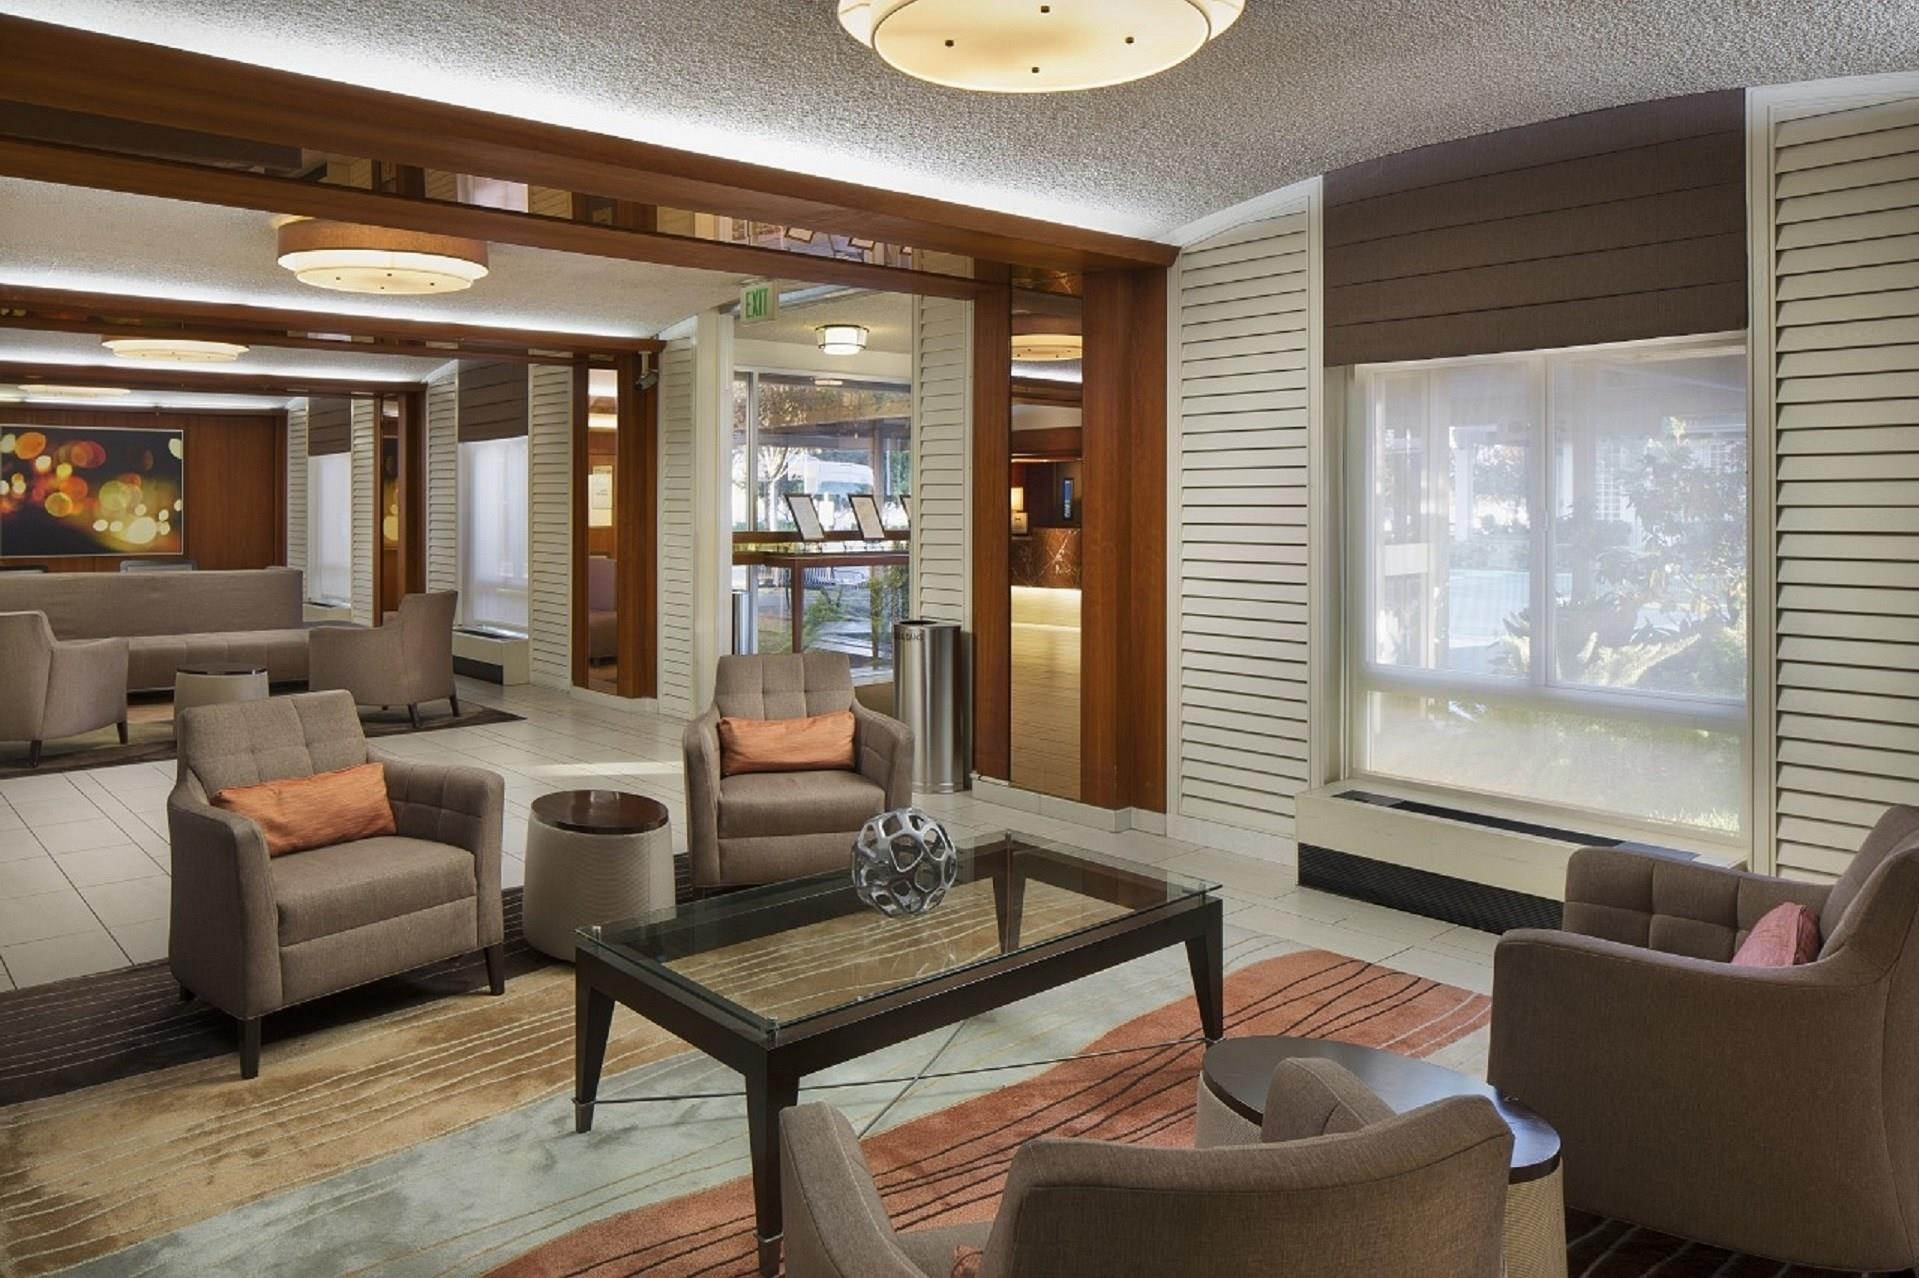 Meetings and Events at Hilton Garden Inn San Francisco/Oakland Bay ...